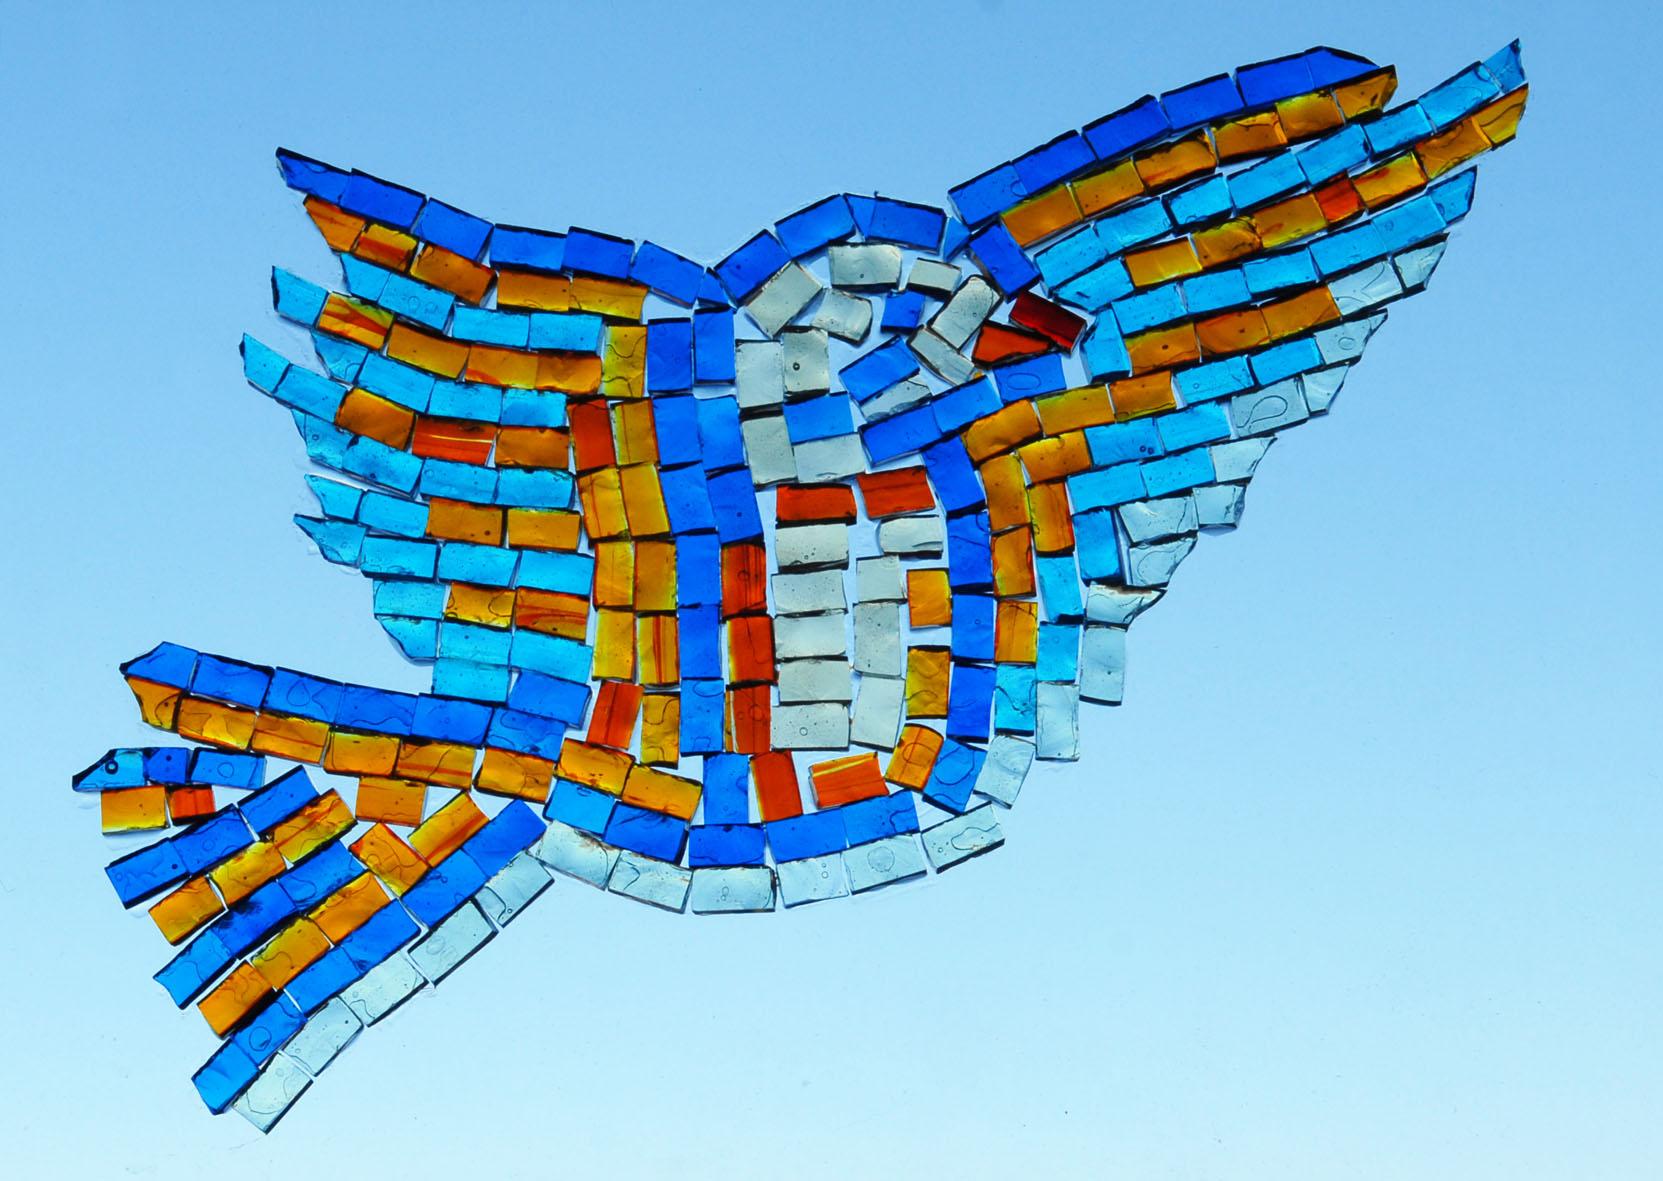 Bird, transparent glass mosaics